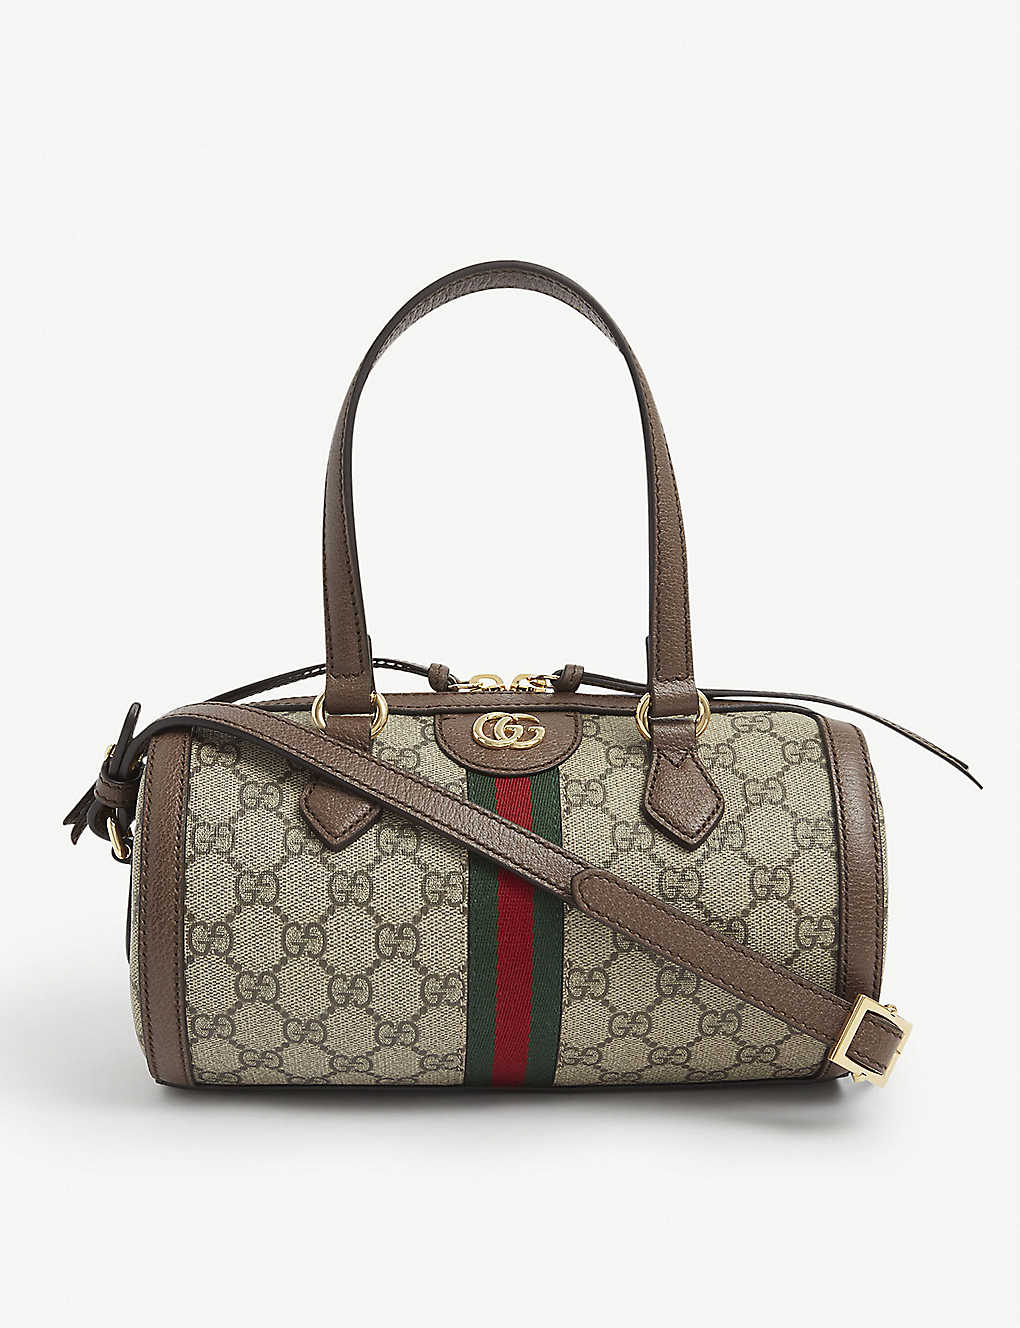 Gucci OPHIDIA GG SMALL BOSTON CANVAS SHOULDER BAG